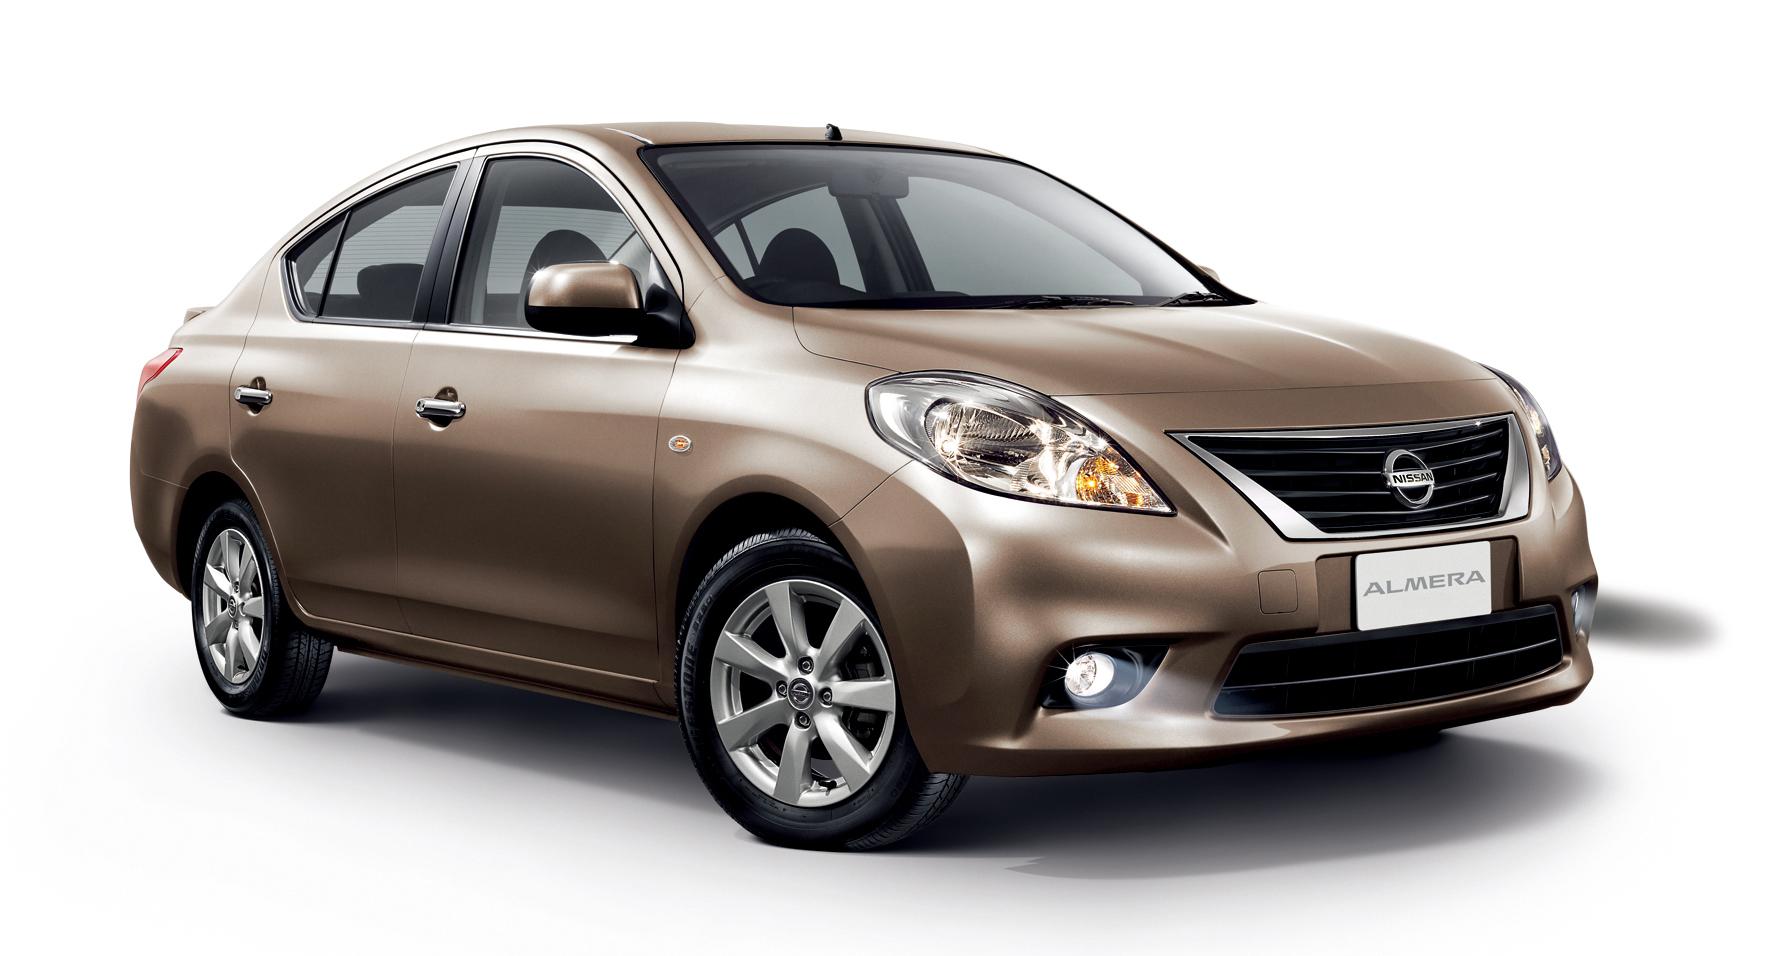 2019 Toyota Supra Price >> Nissan Almera coming in 2012 - photos | CarAdvice